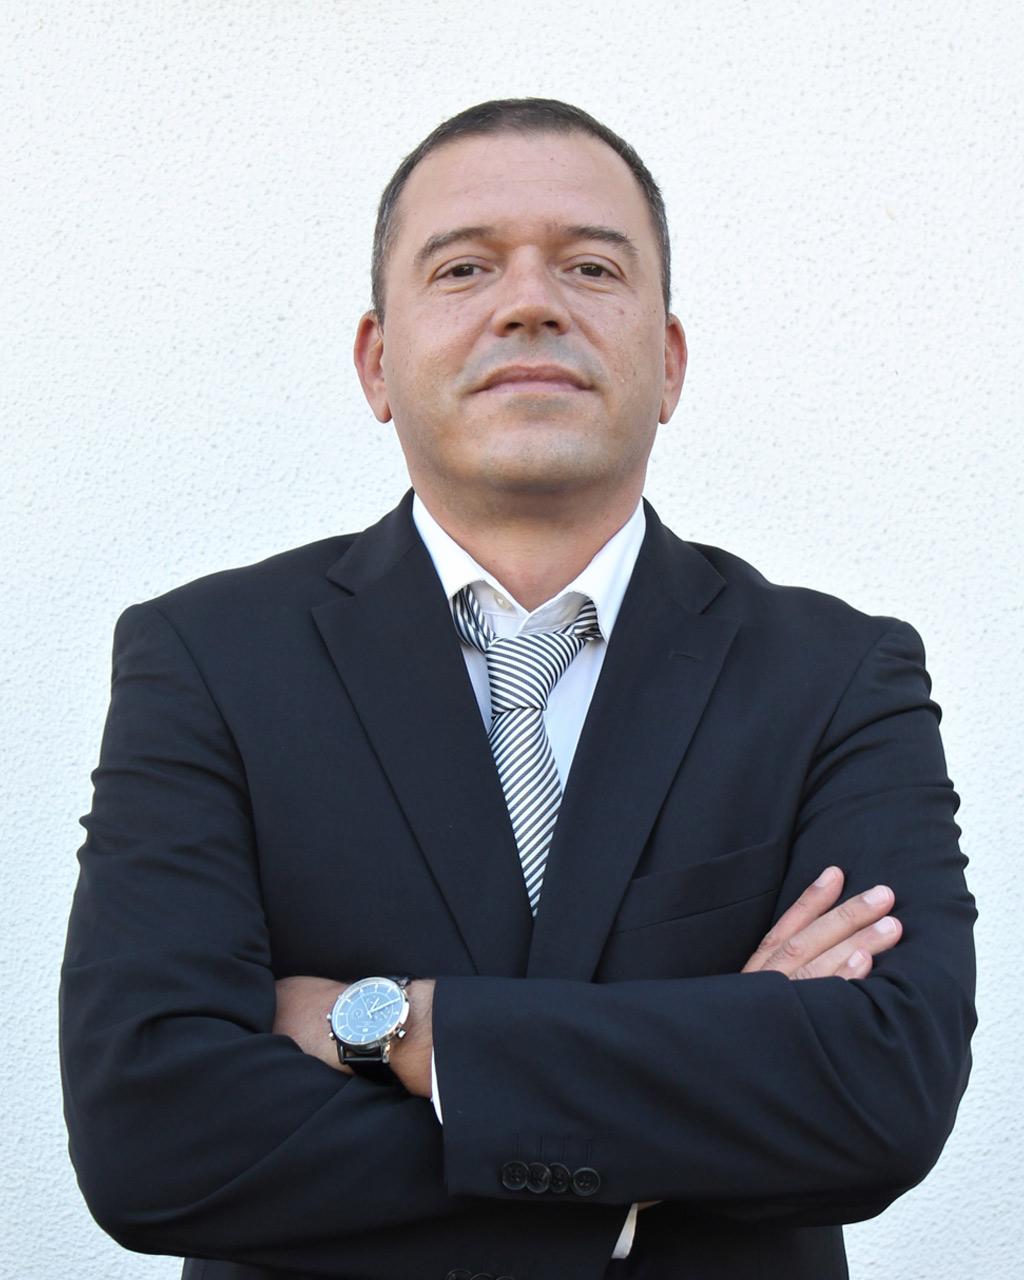 Nuno de Oliveira Antunes